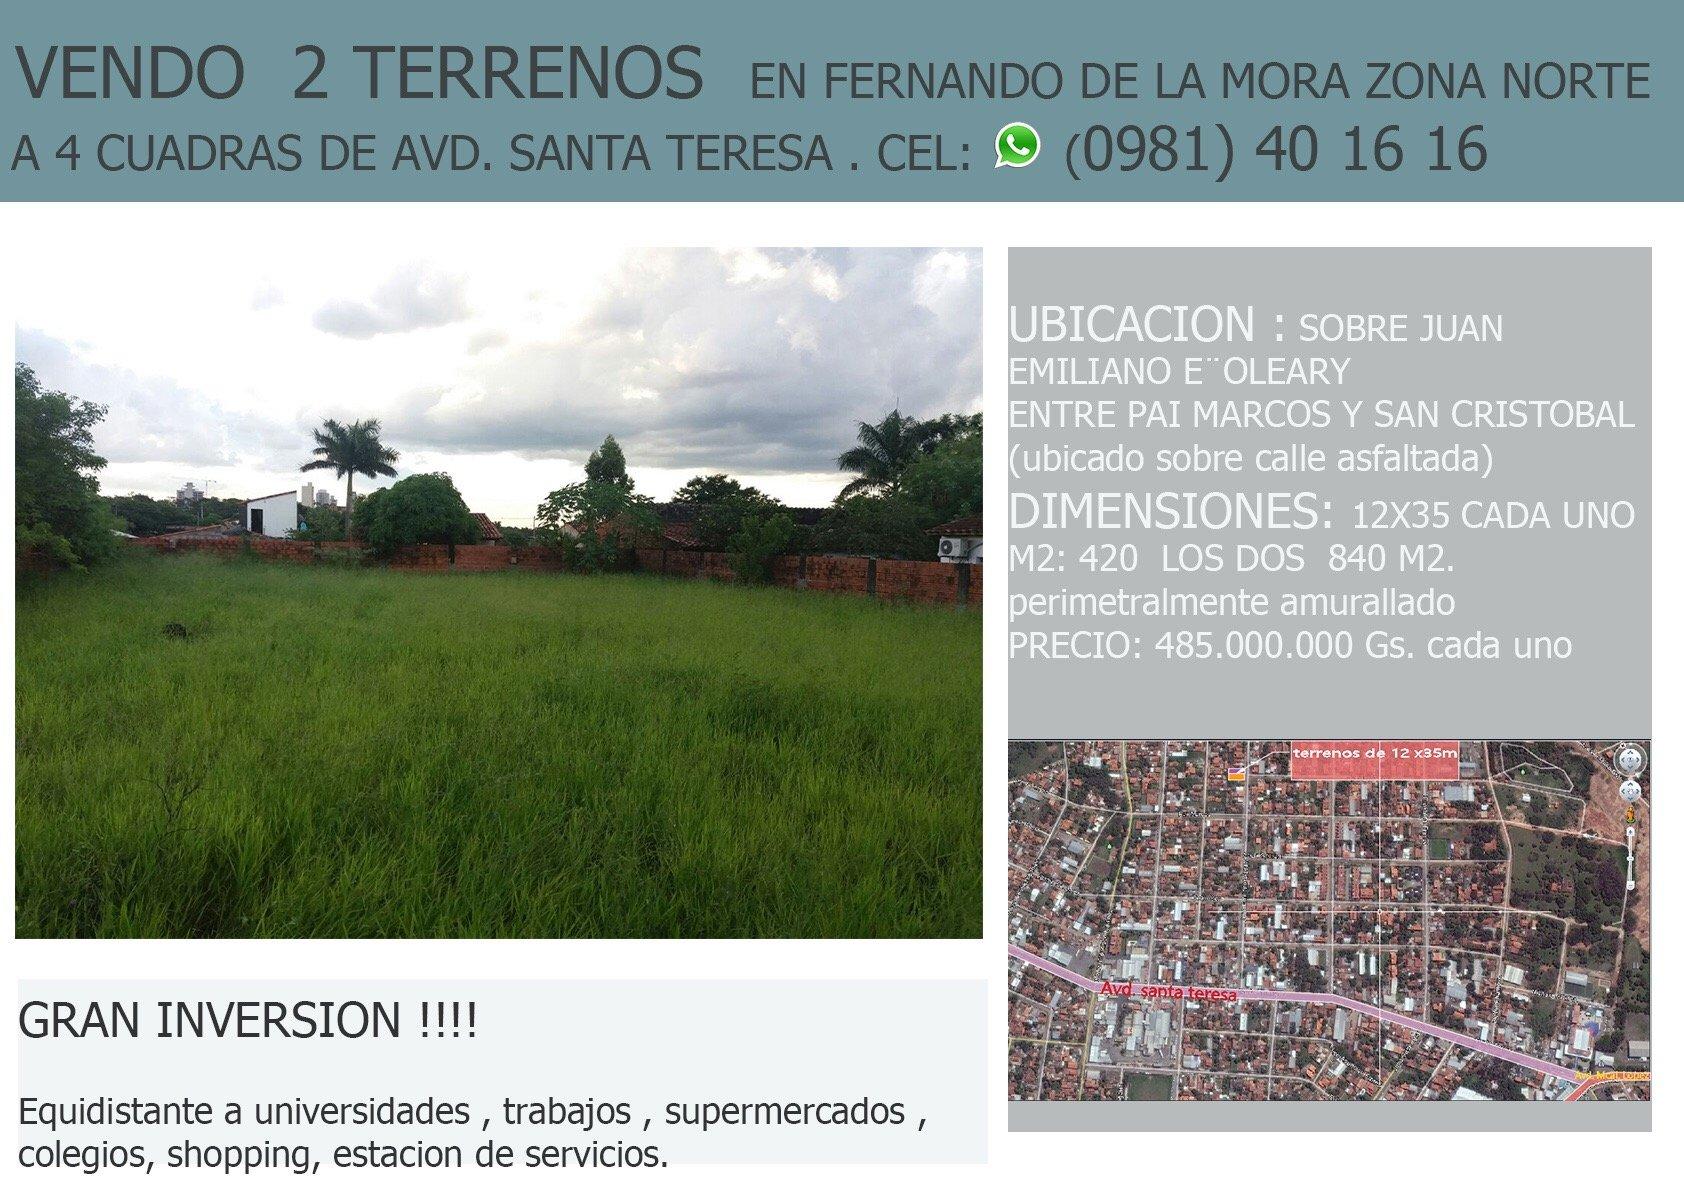 Terrenos En Fernando De La Mora Zona Norte A 4 Cuadras De Avda. Santa Teresa